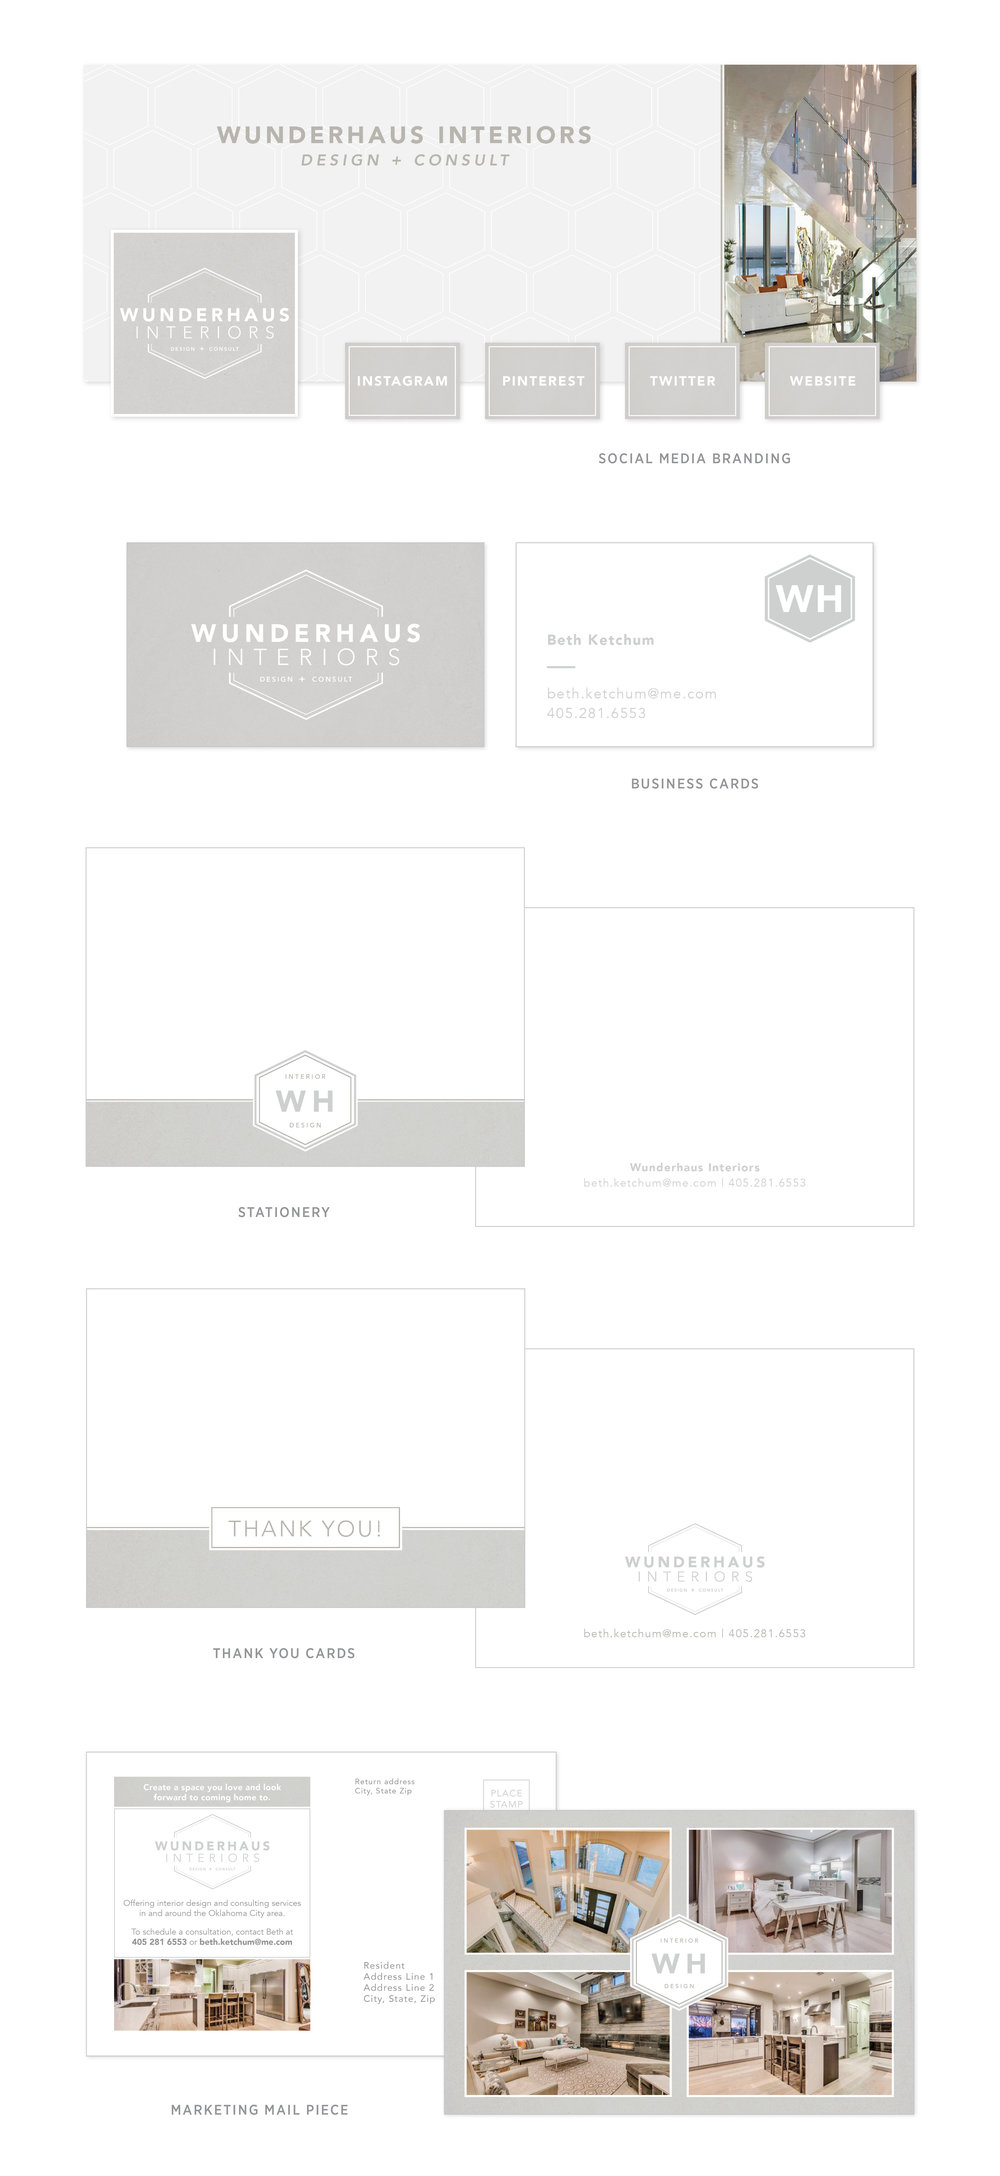 Wunderhaus Interiors branding + collateral design | casilong.com #casilongdesign #fearlesspursuit #branding